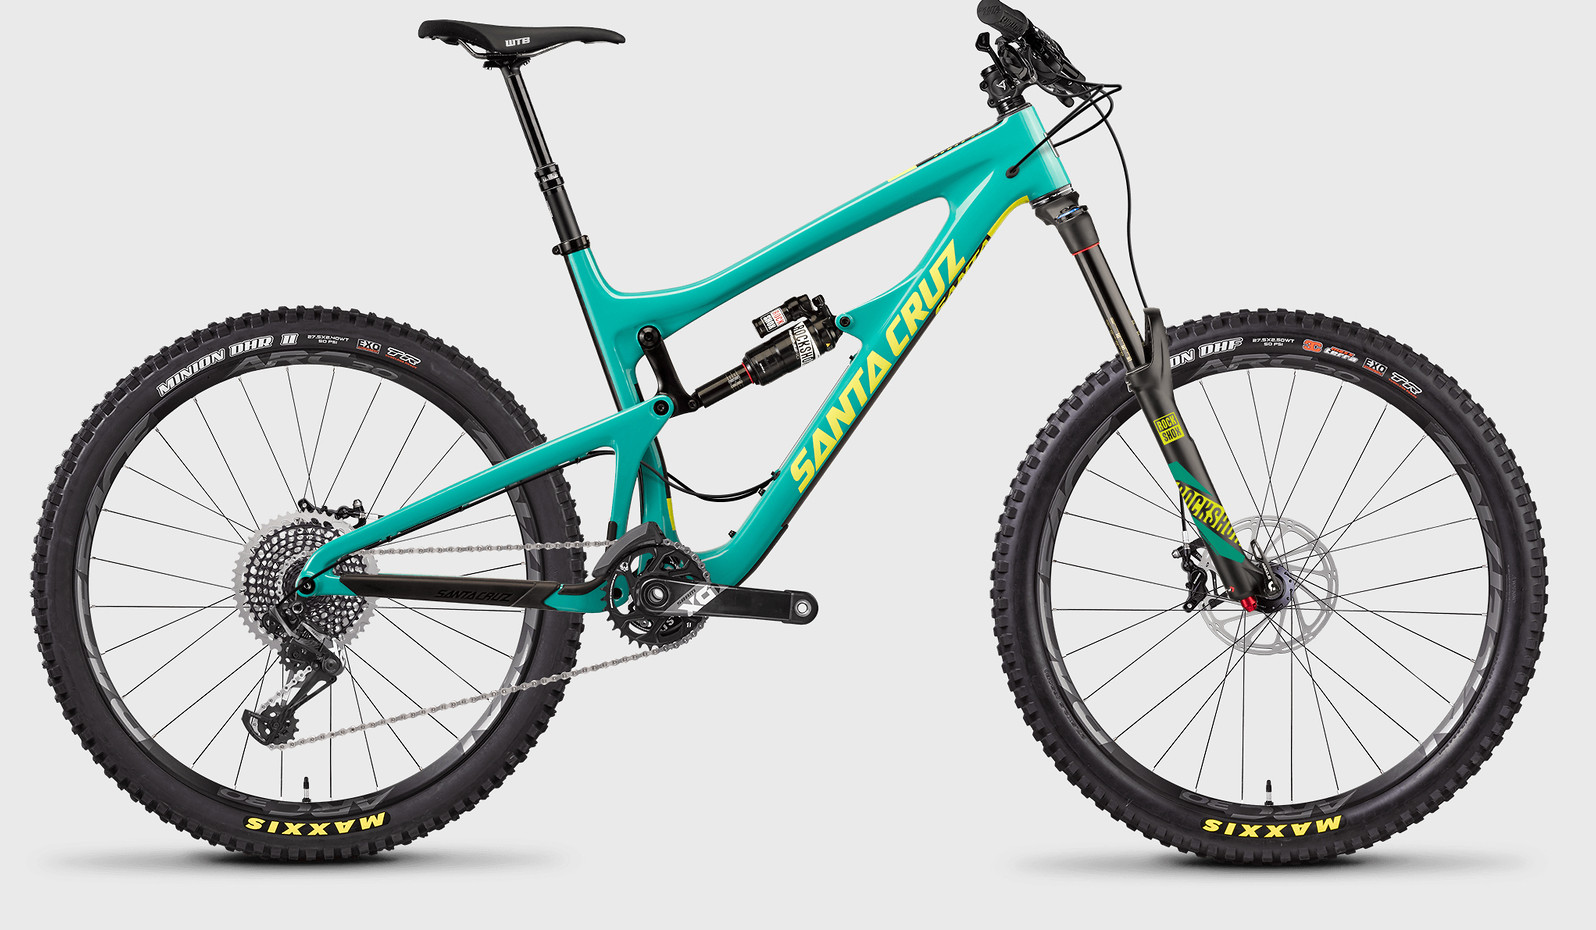 2017 Santa Cruz Nomad Carbon Cc X01 Bike Reviews